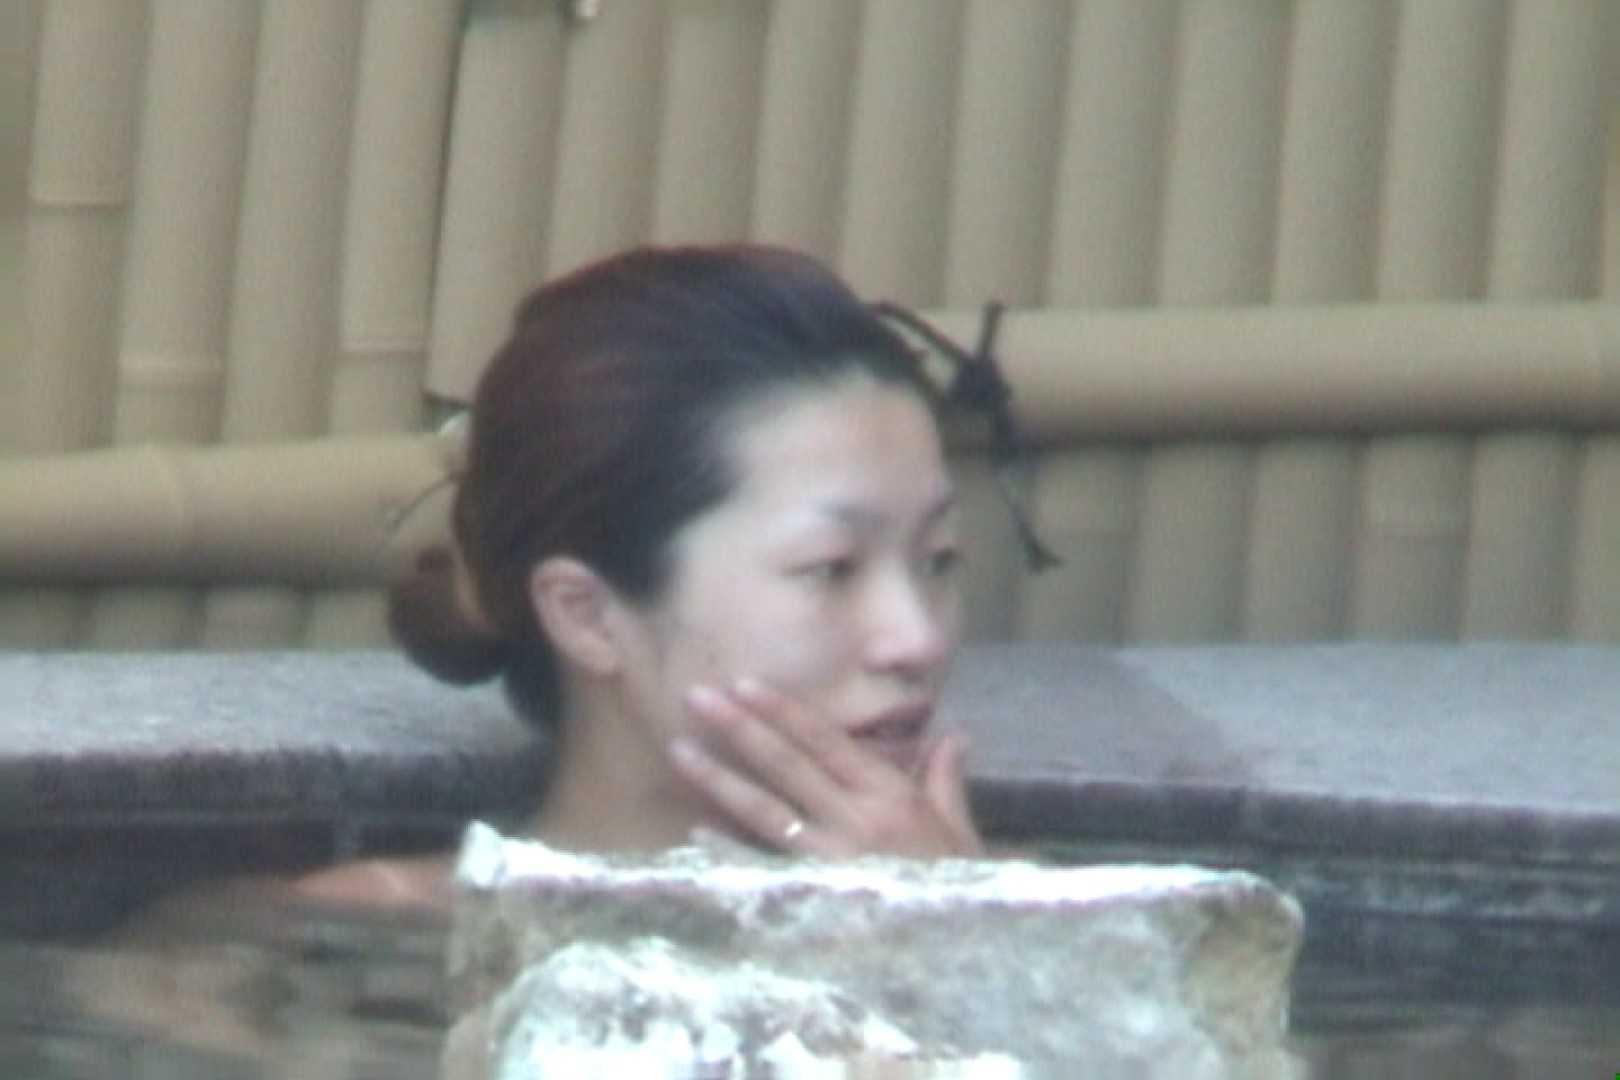 Aquaな露天風呂Vol.571 盗撮映像  35Pix 8